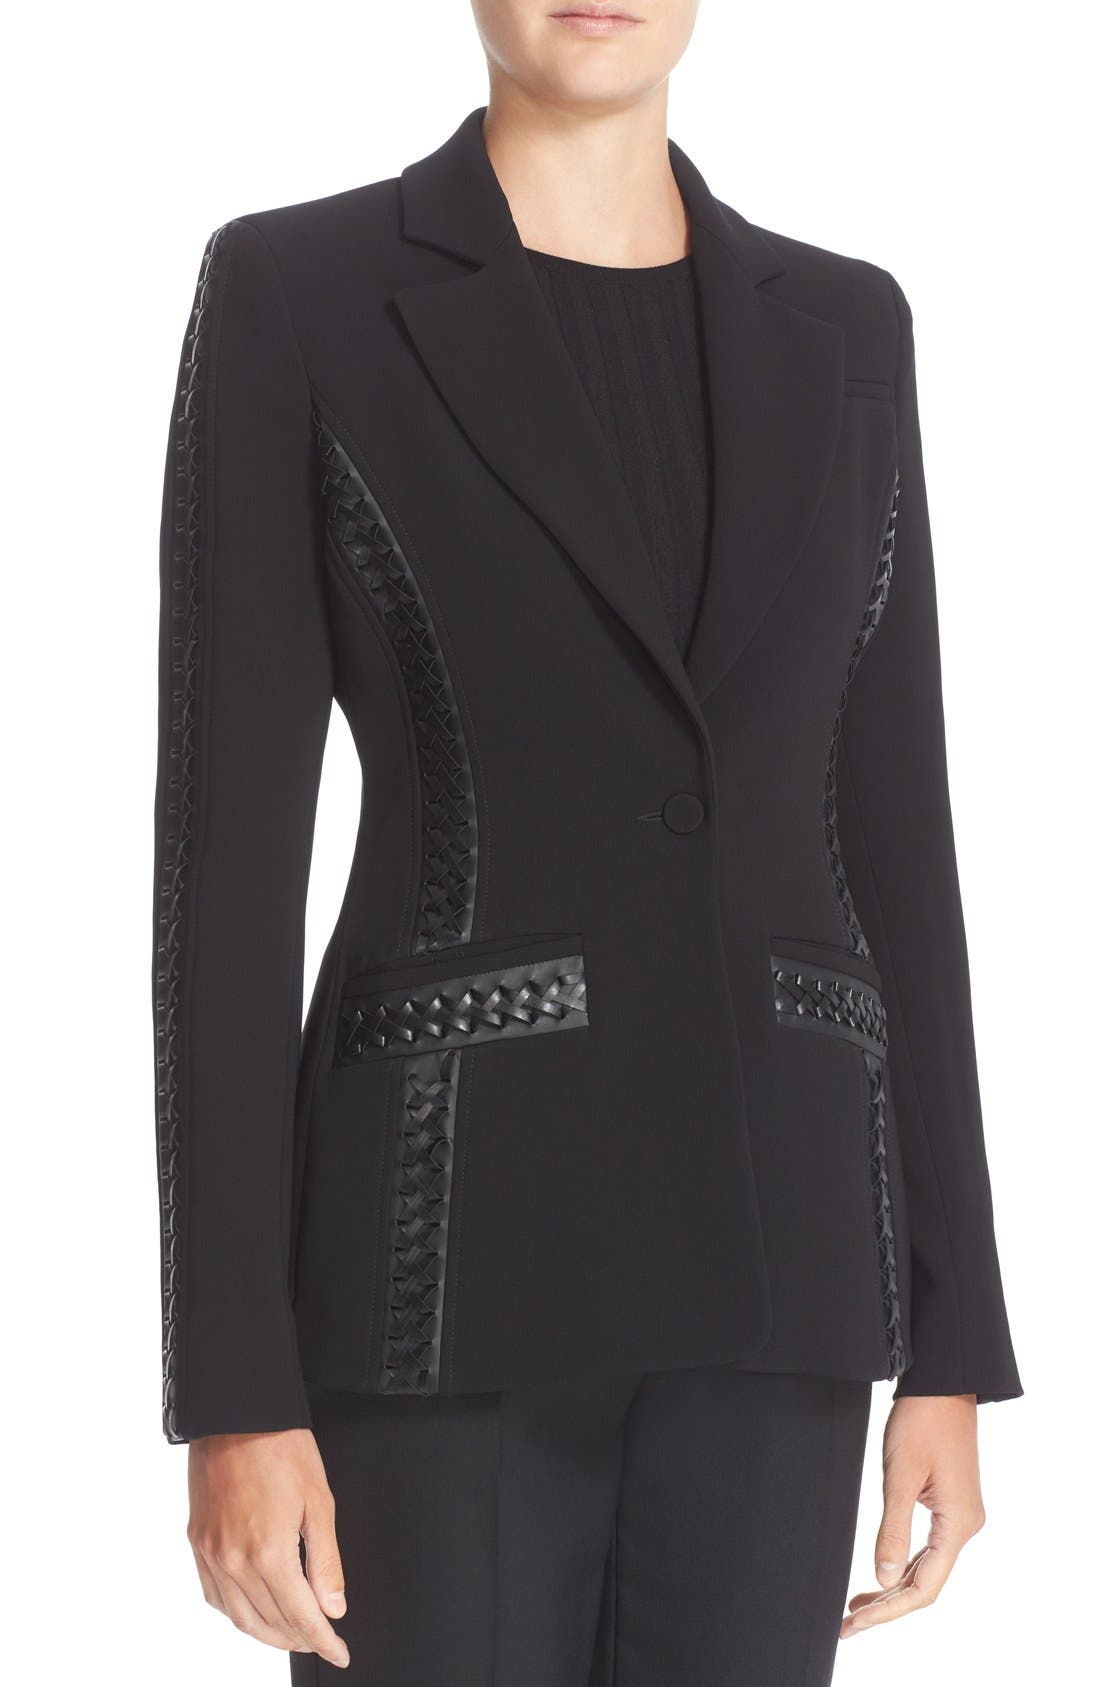 Acacia Lace Detail Jacket,                             Alternate thumbnail 5, color,                             Black